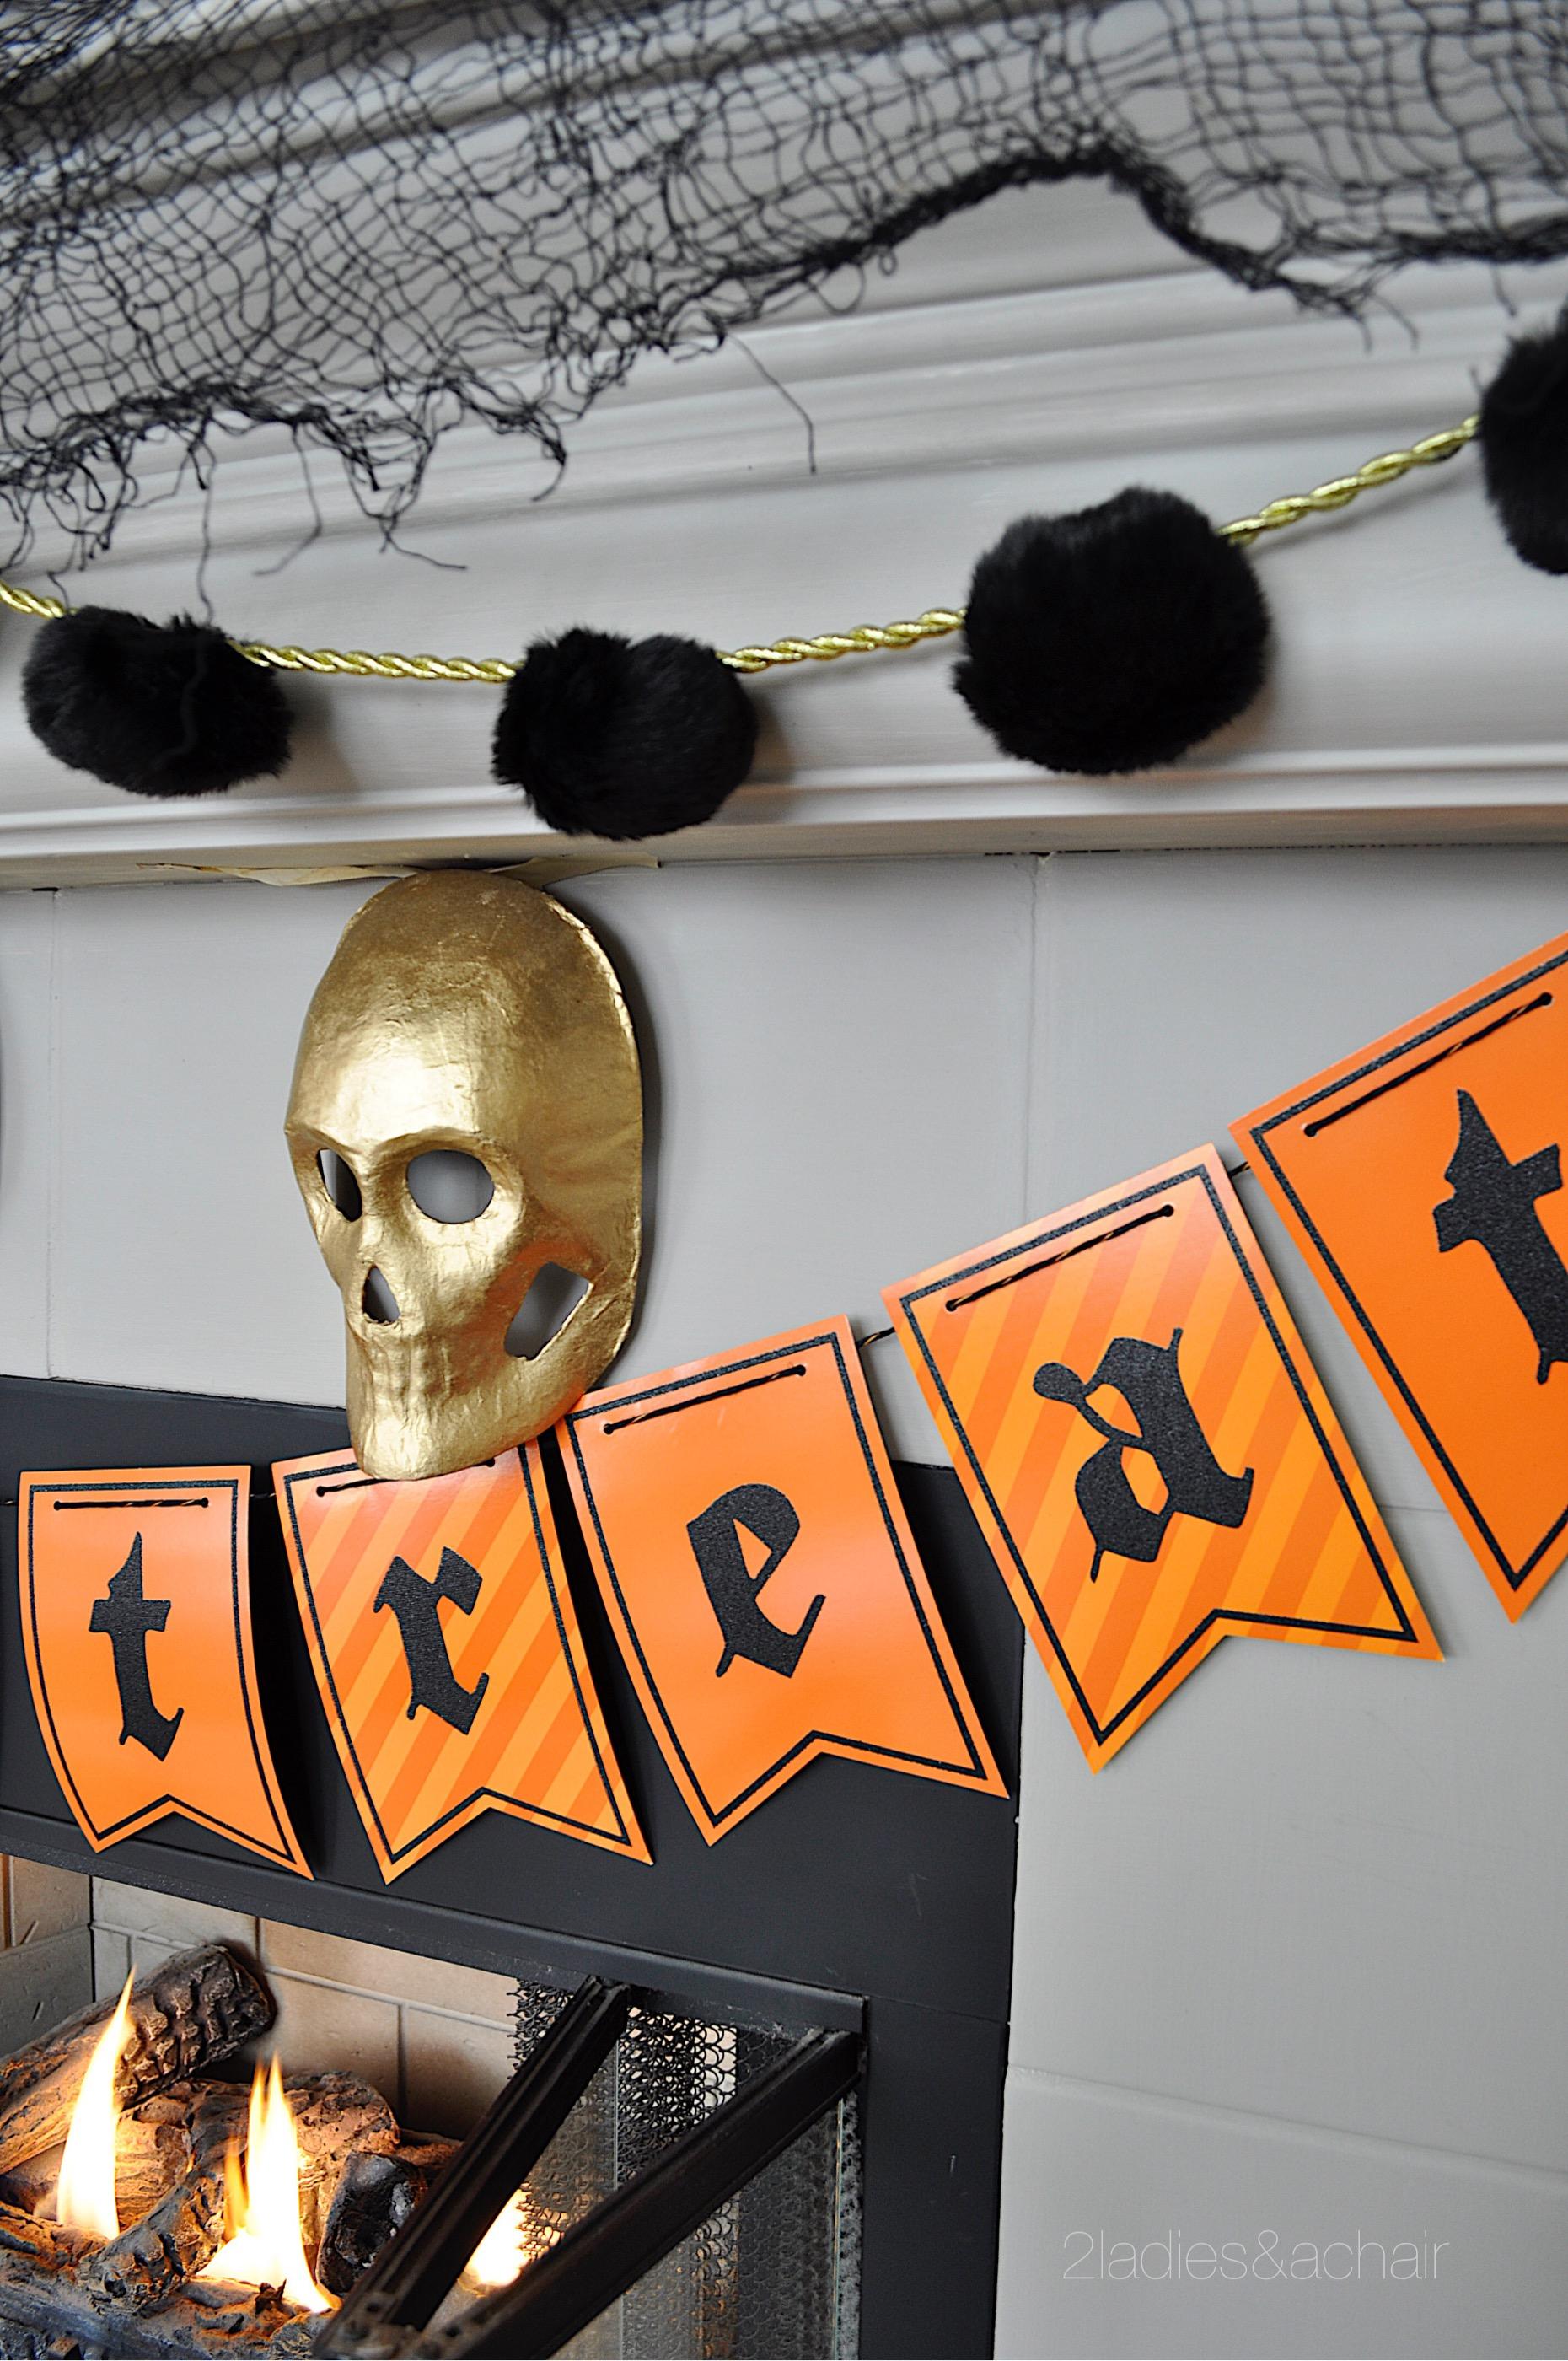 halloween mantel decorations IMG_8211.JPG